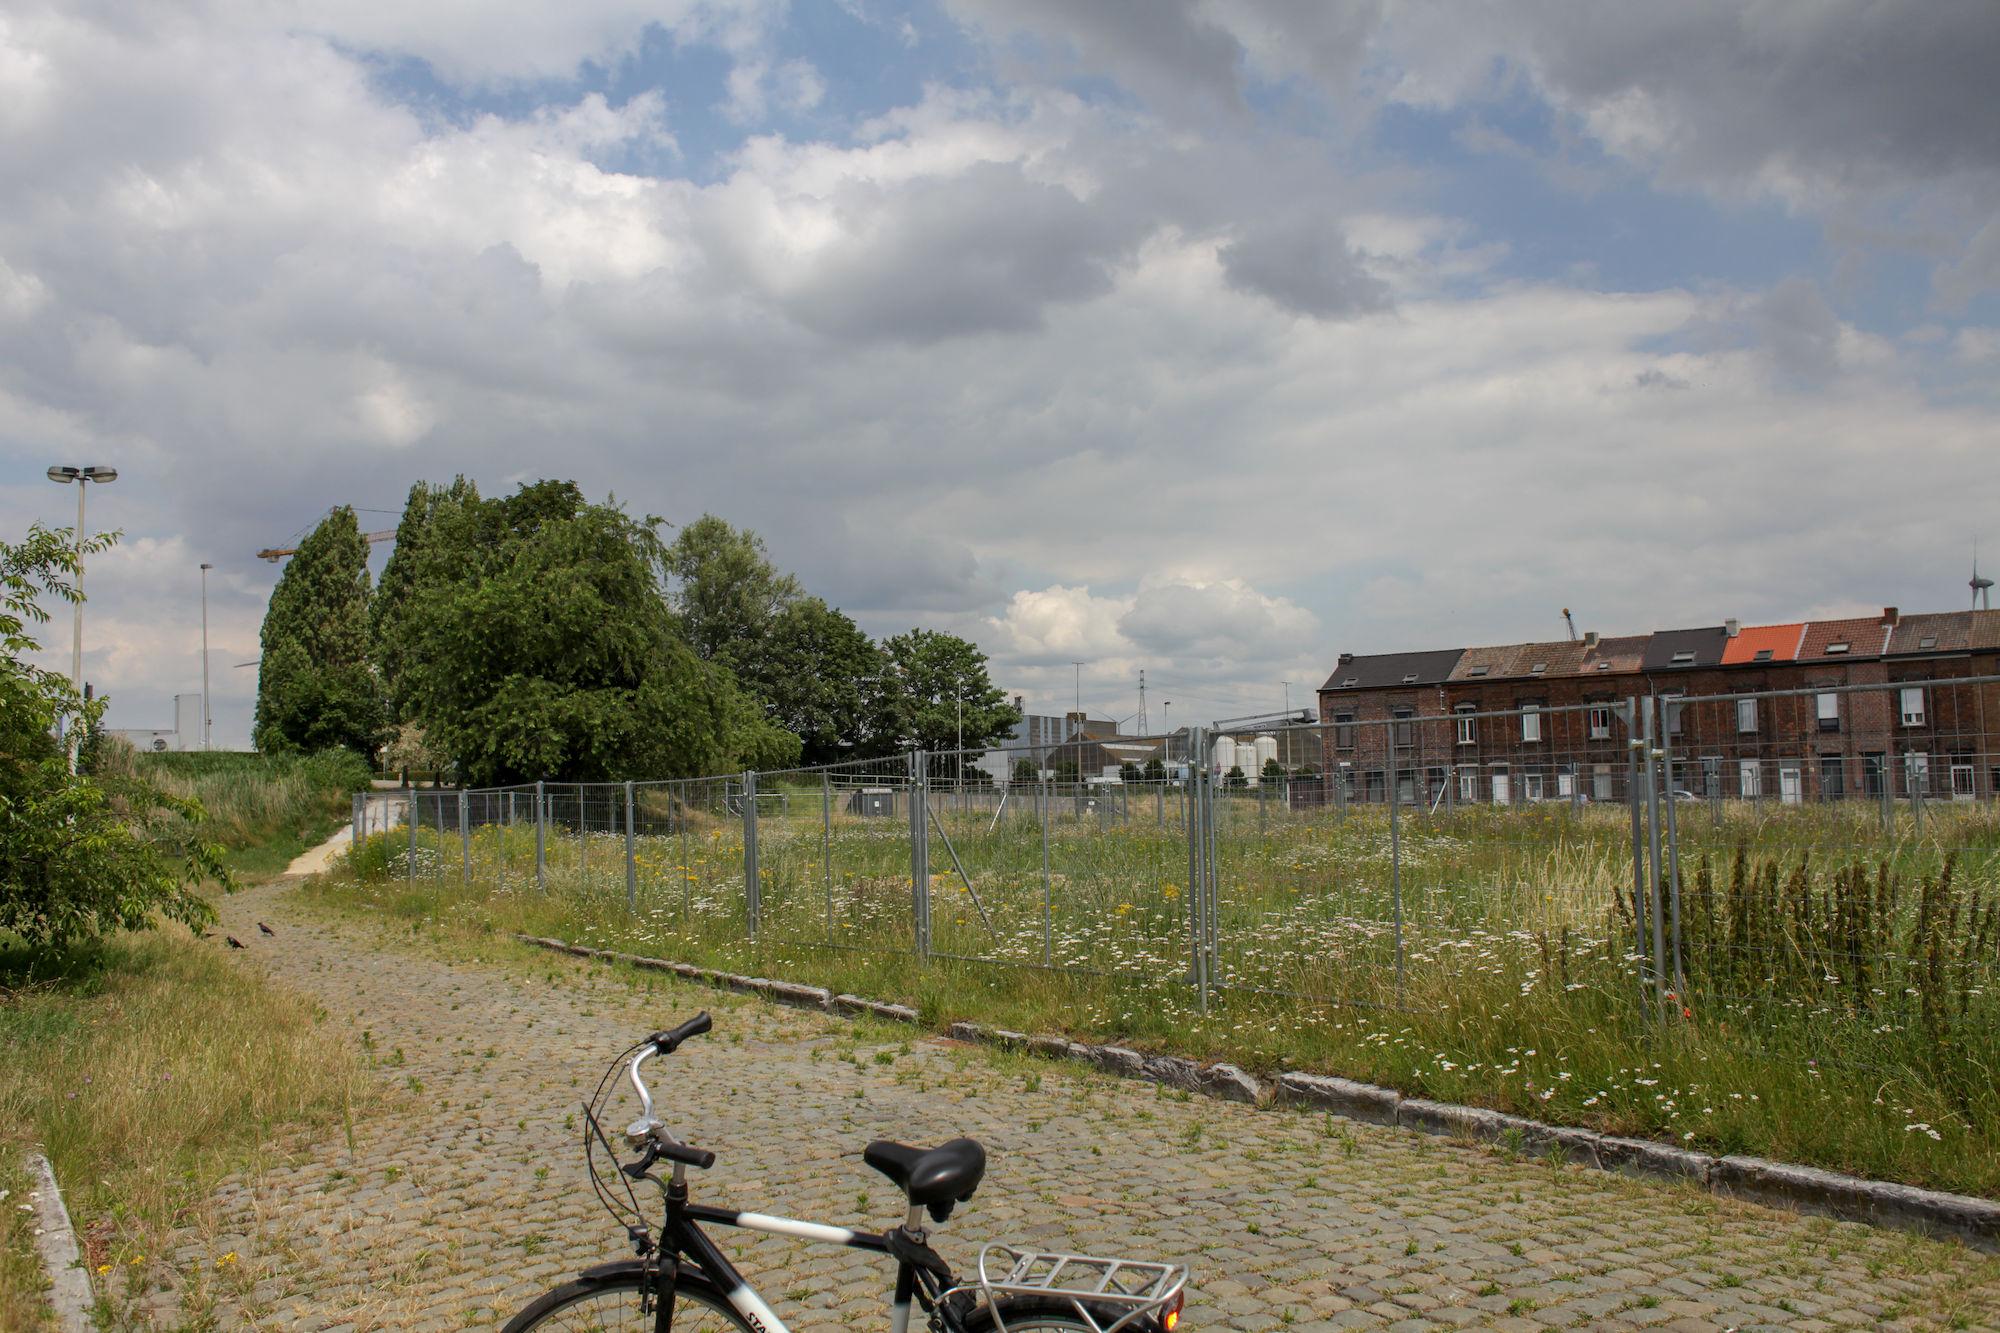 2019-07-02 Muide Meulestede prospectie Wannes_stadsvernieuwing_IMG_0376-2.jpg